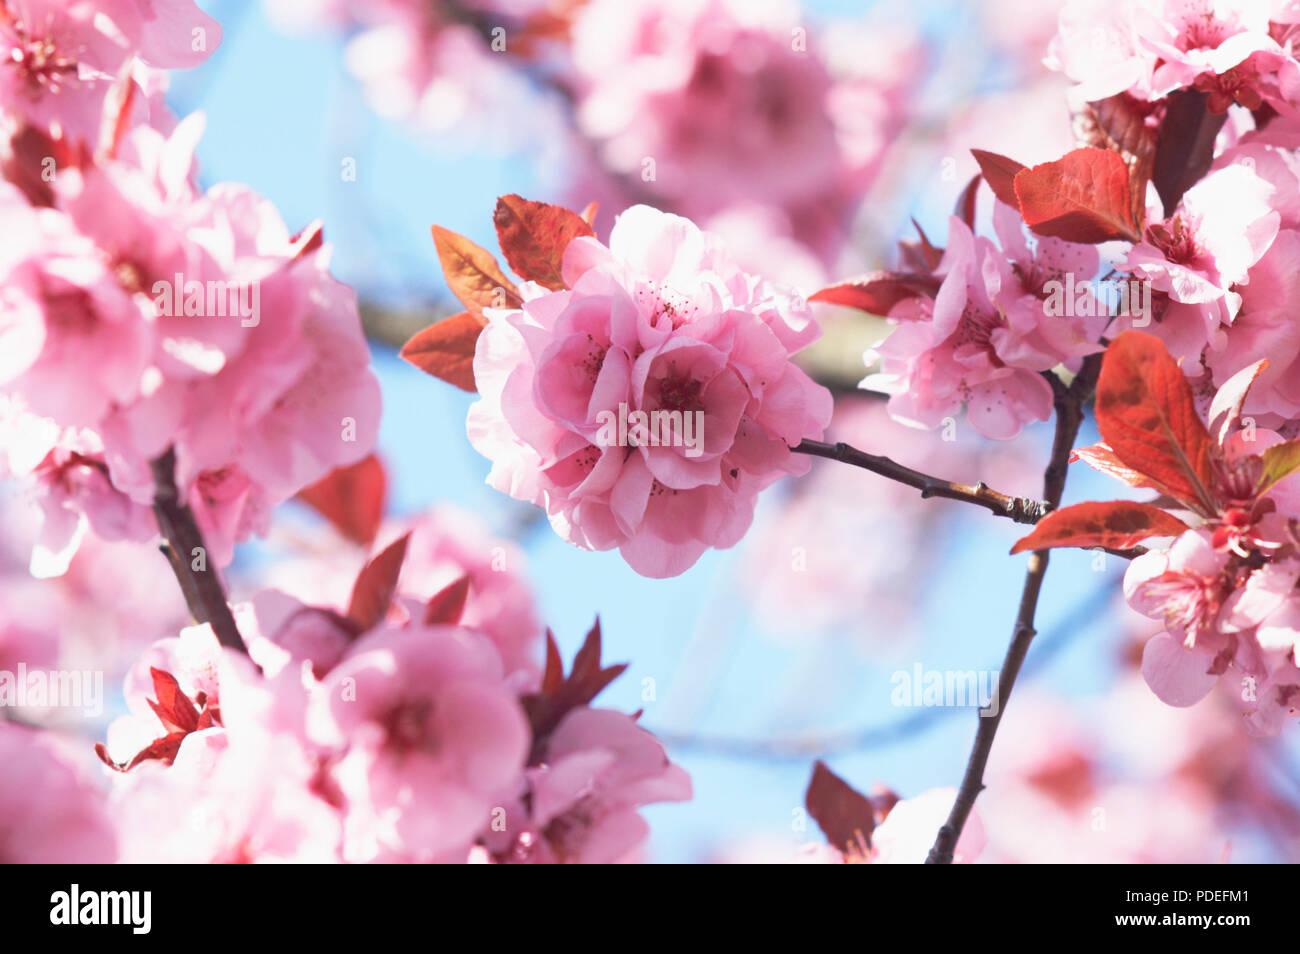 Cherry blossom flowers. - Stock Image